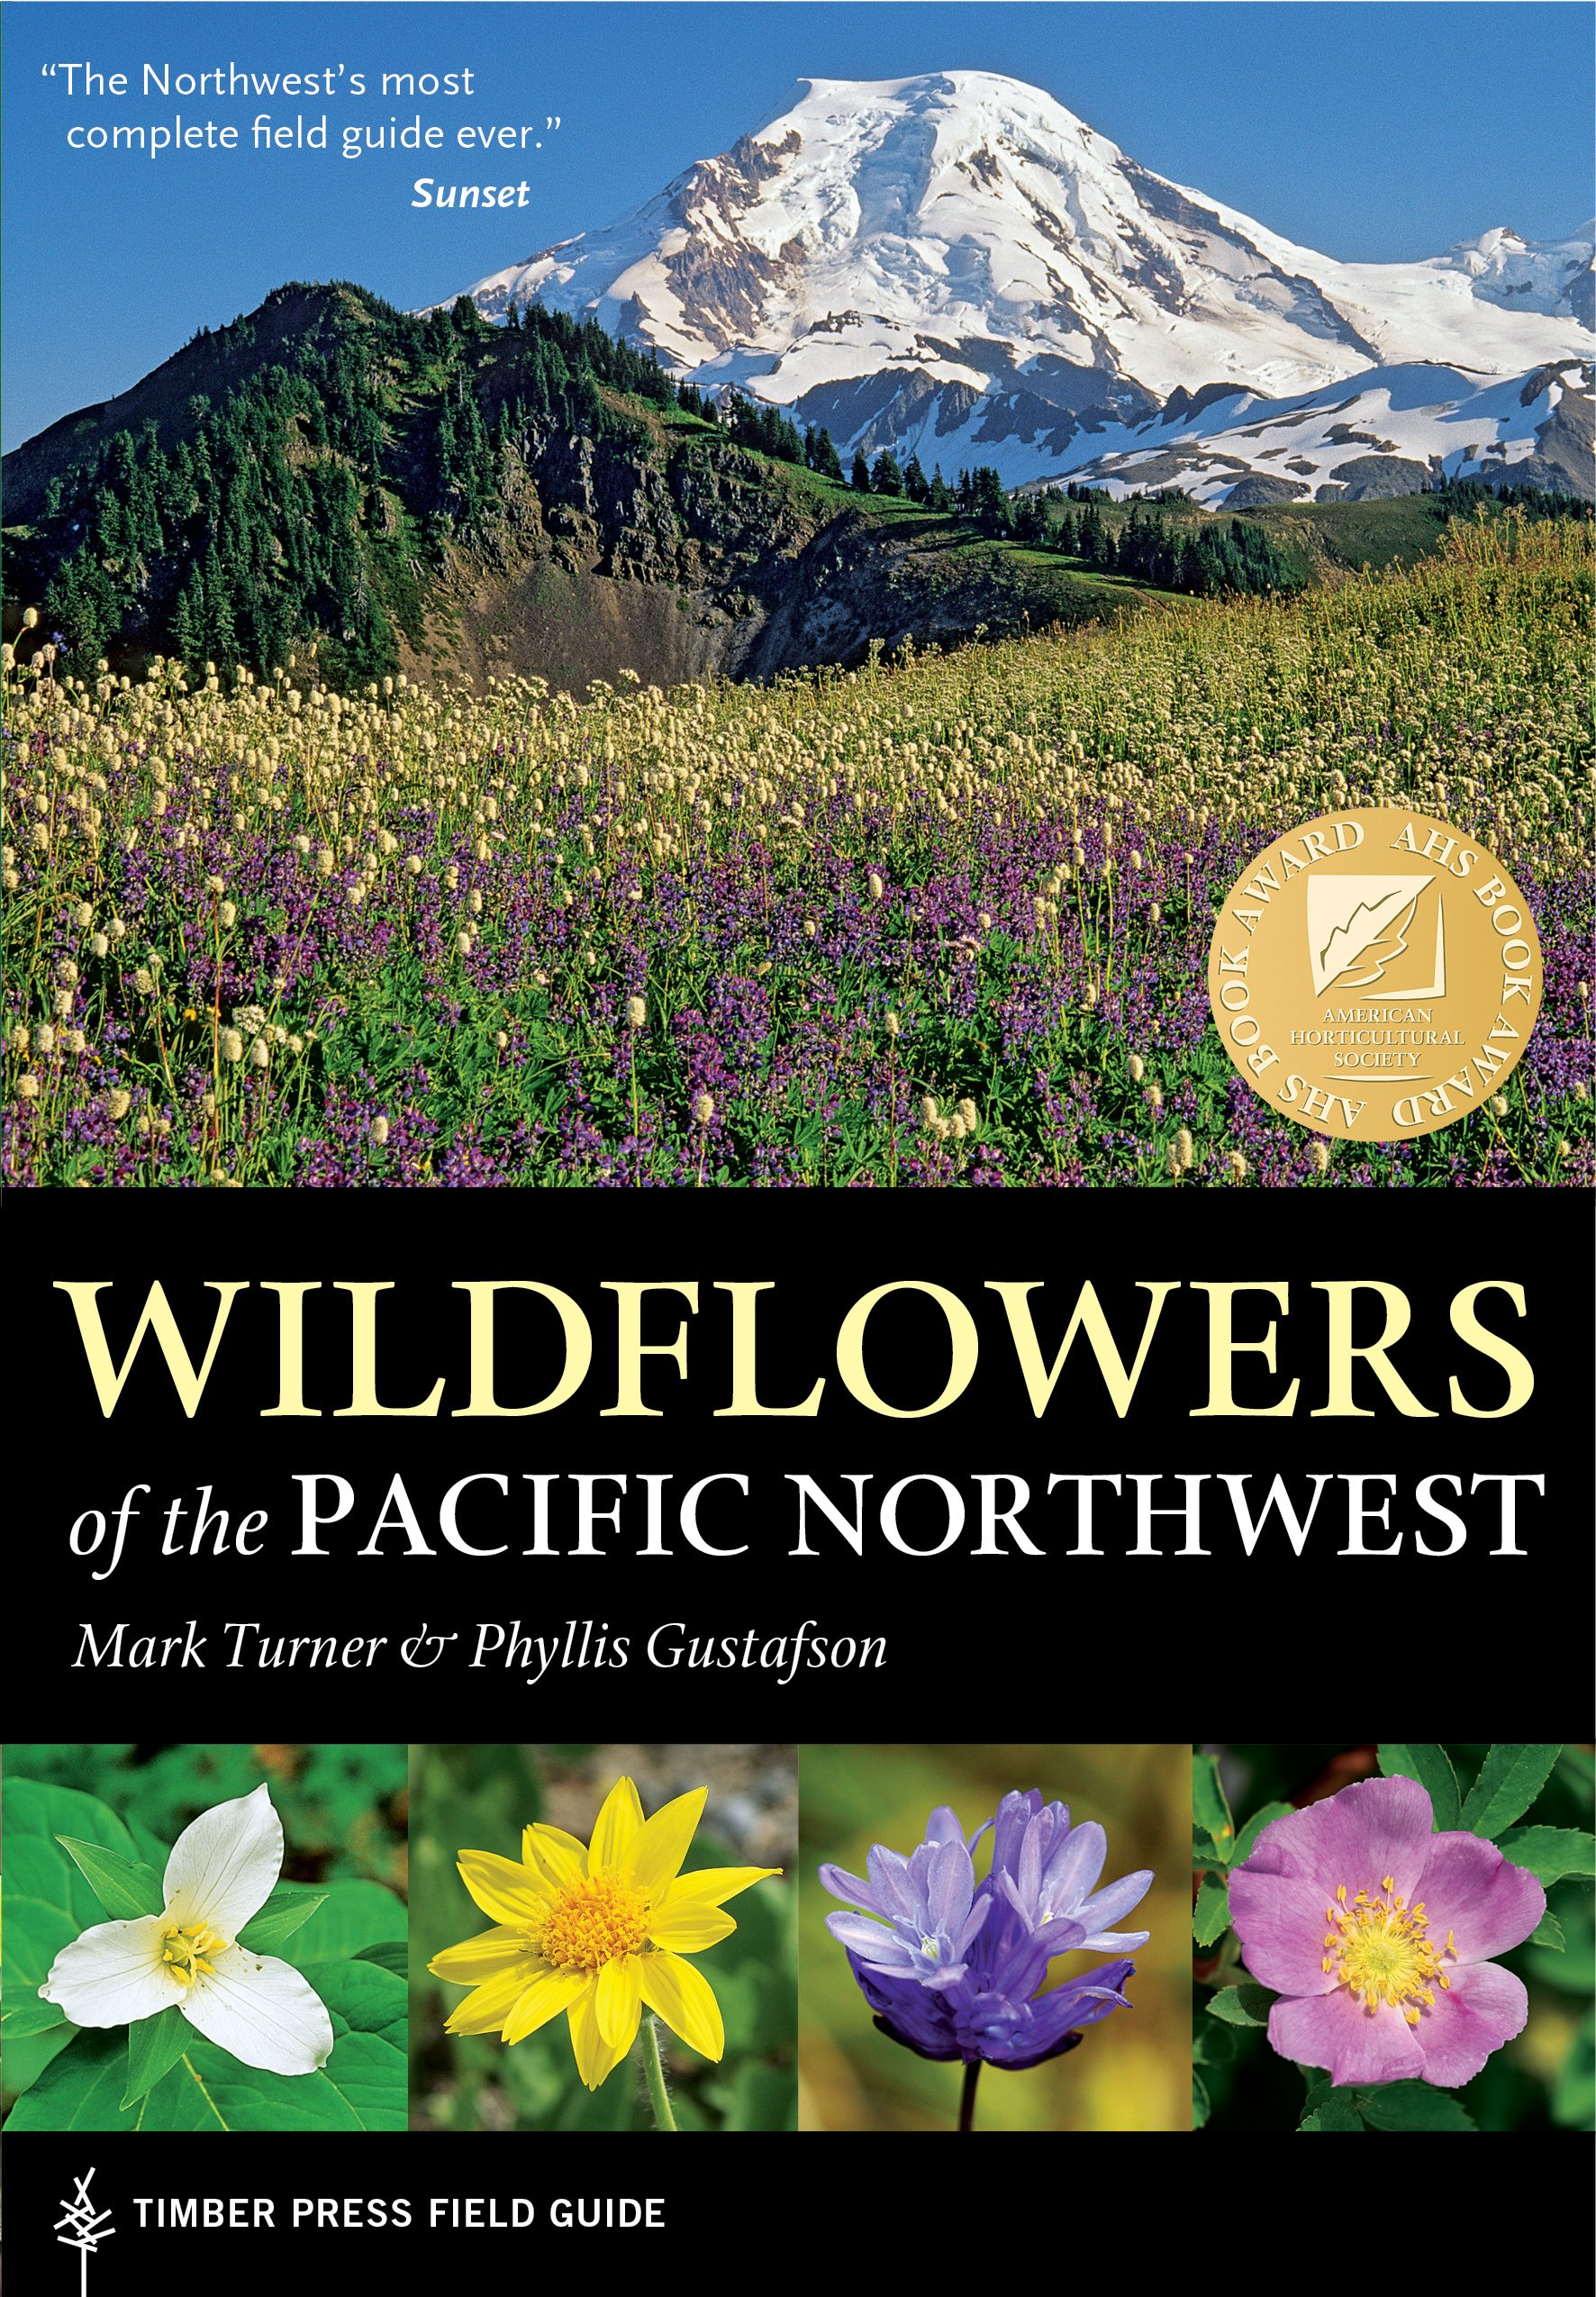 wildflowers of the pacific northwest.jpg